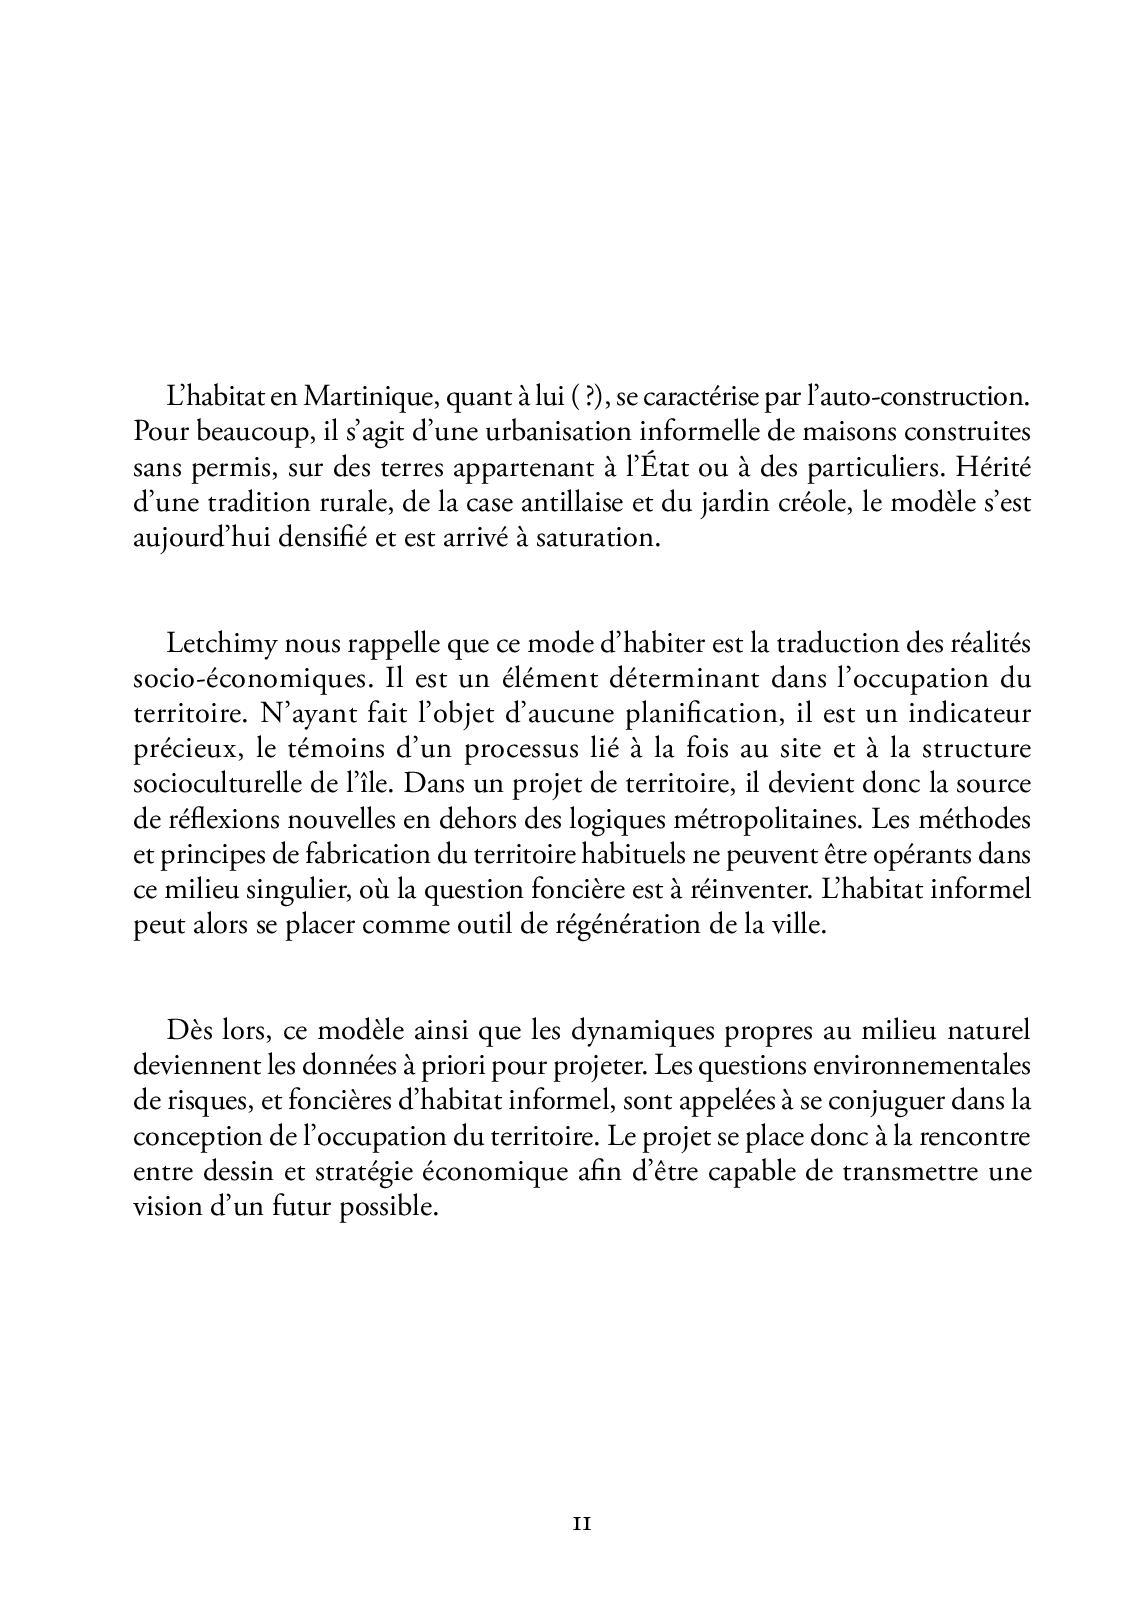 Martinique Le Precheur Calameo Downloader